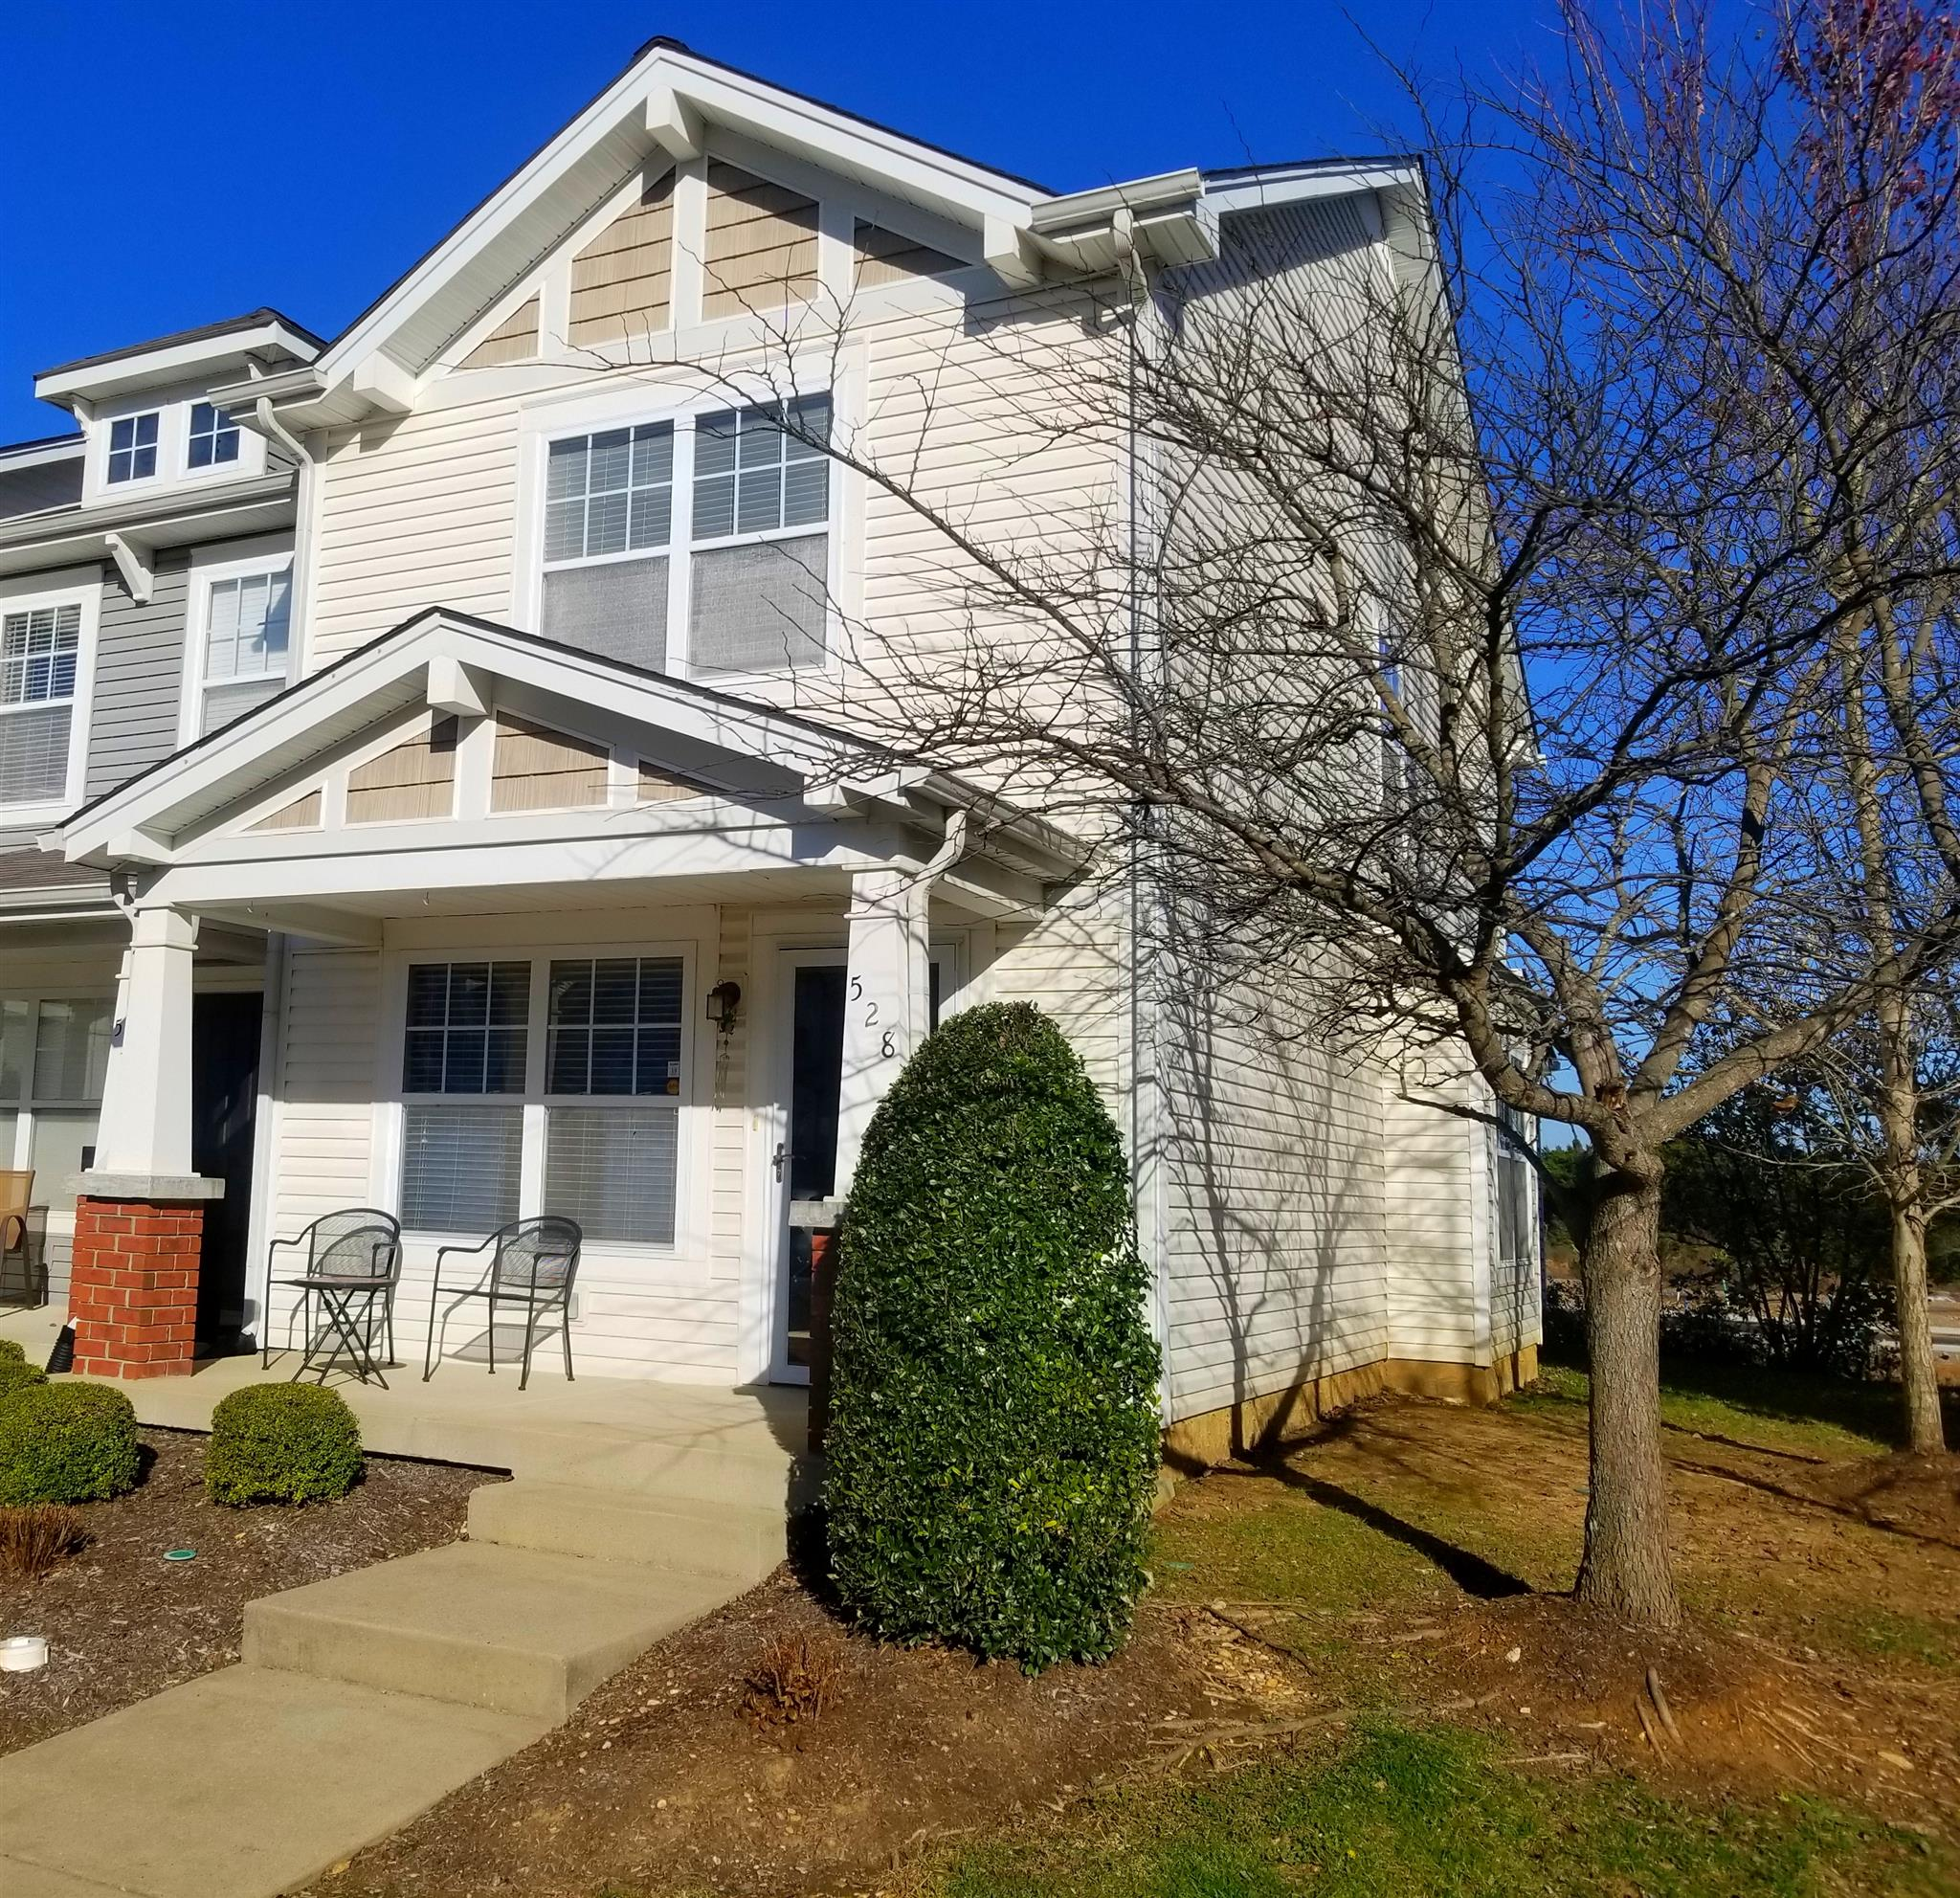 528 Bradburn Village Cir, Nashville-Antioch in Davidson County County, TN 37013 Home for Sale